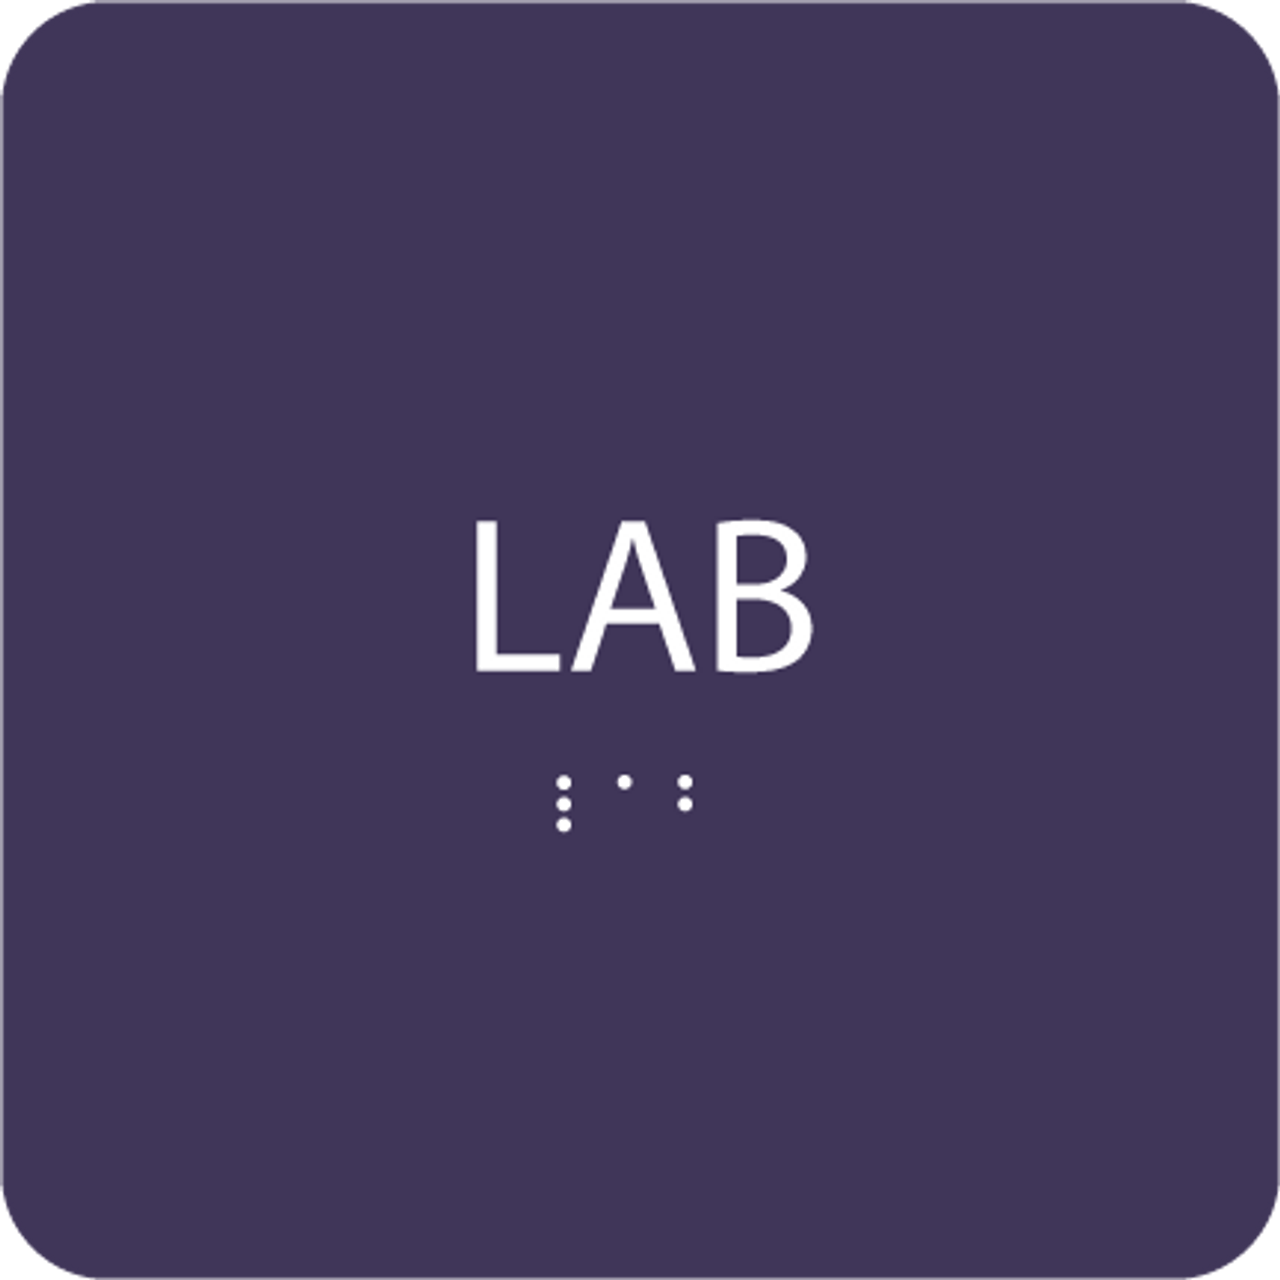 Purple Lab ADA Sign